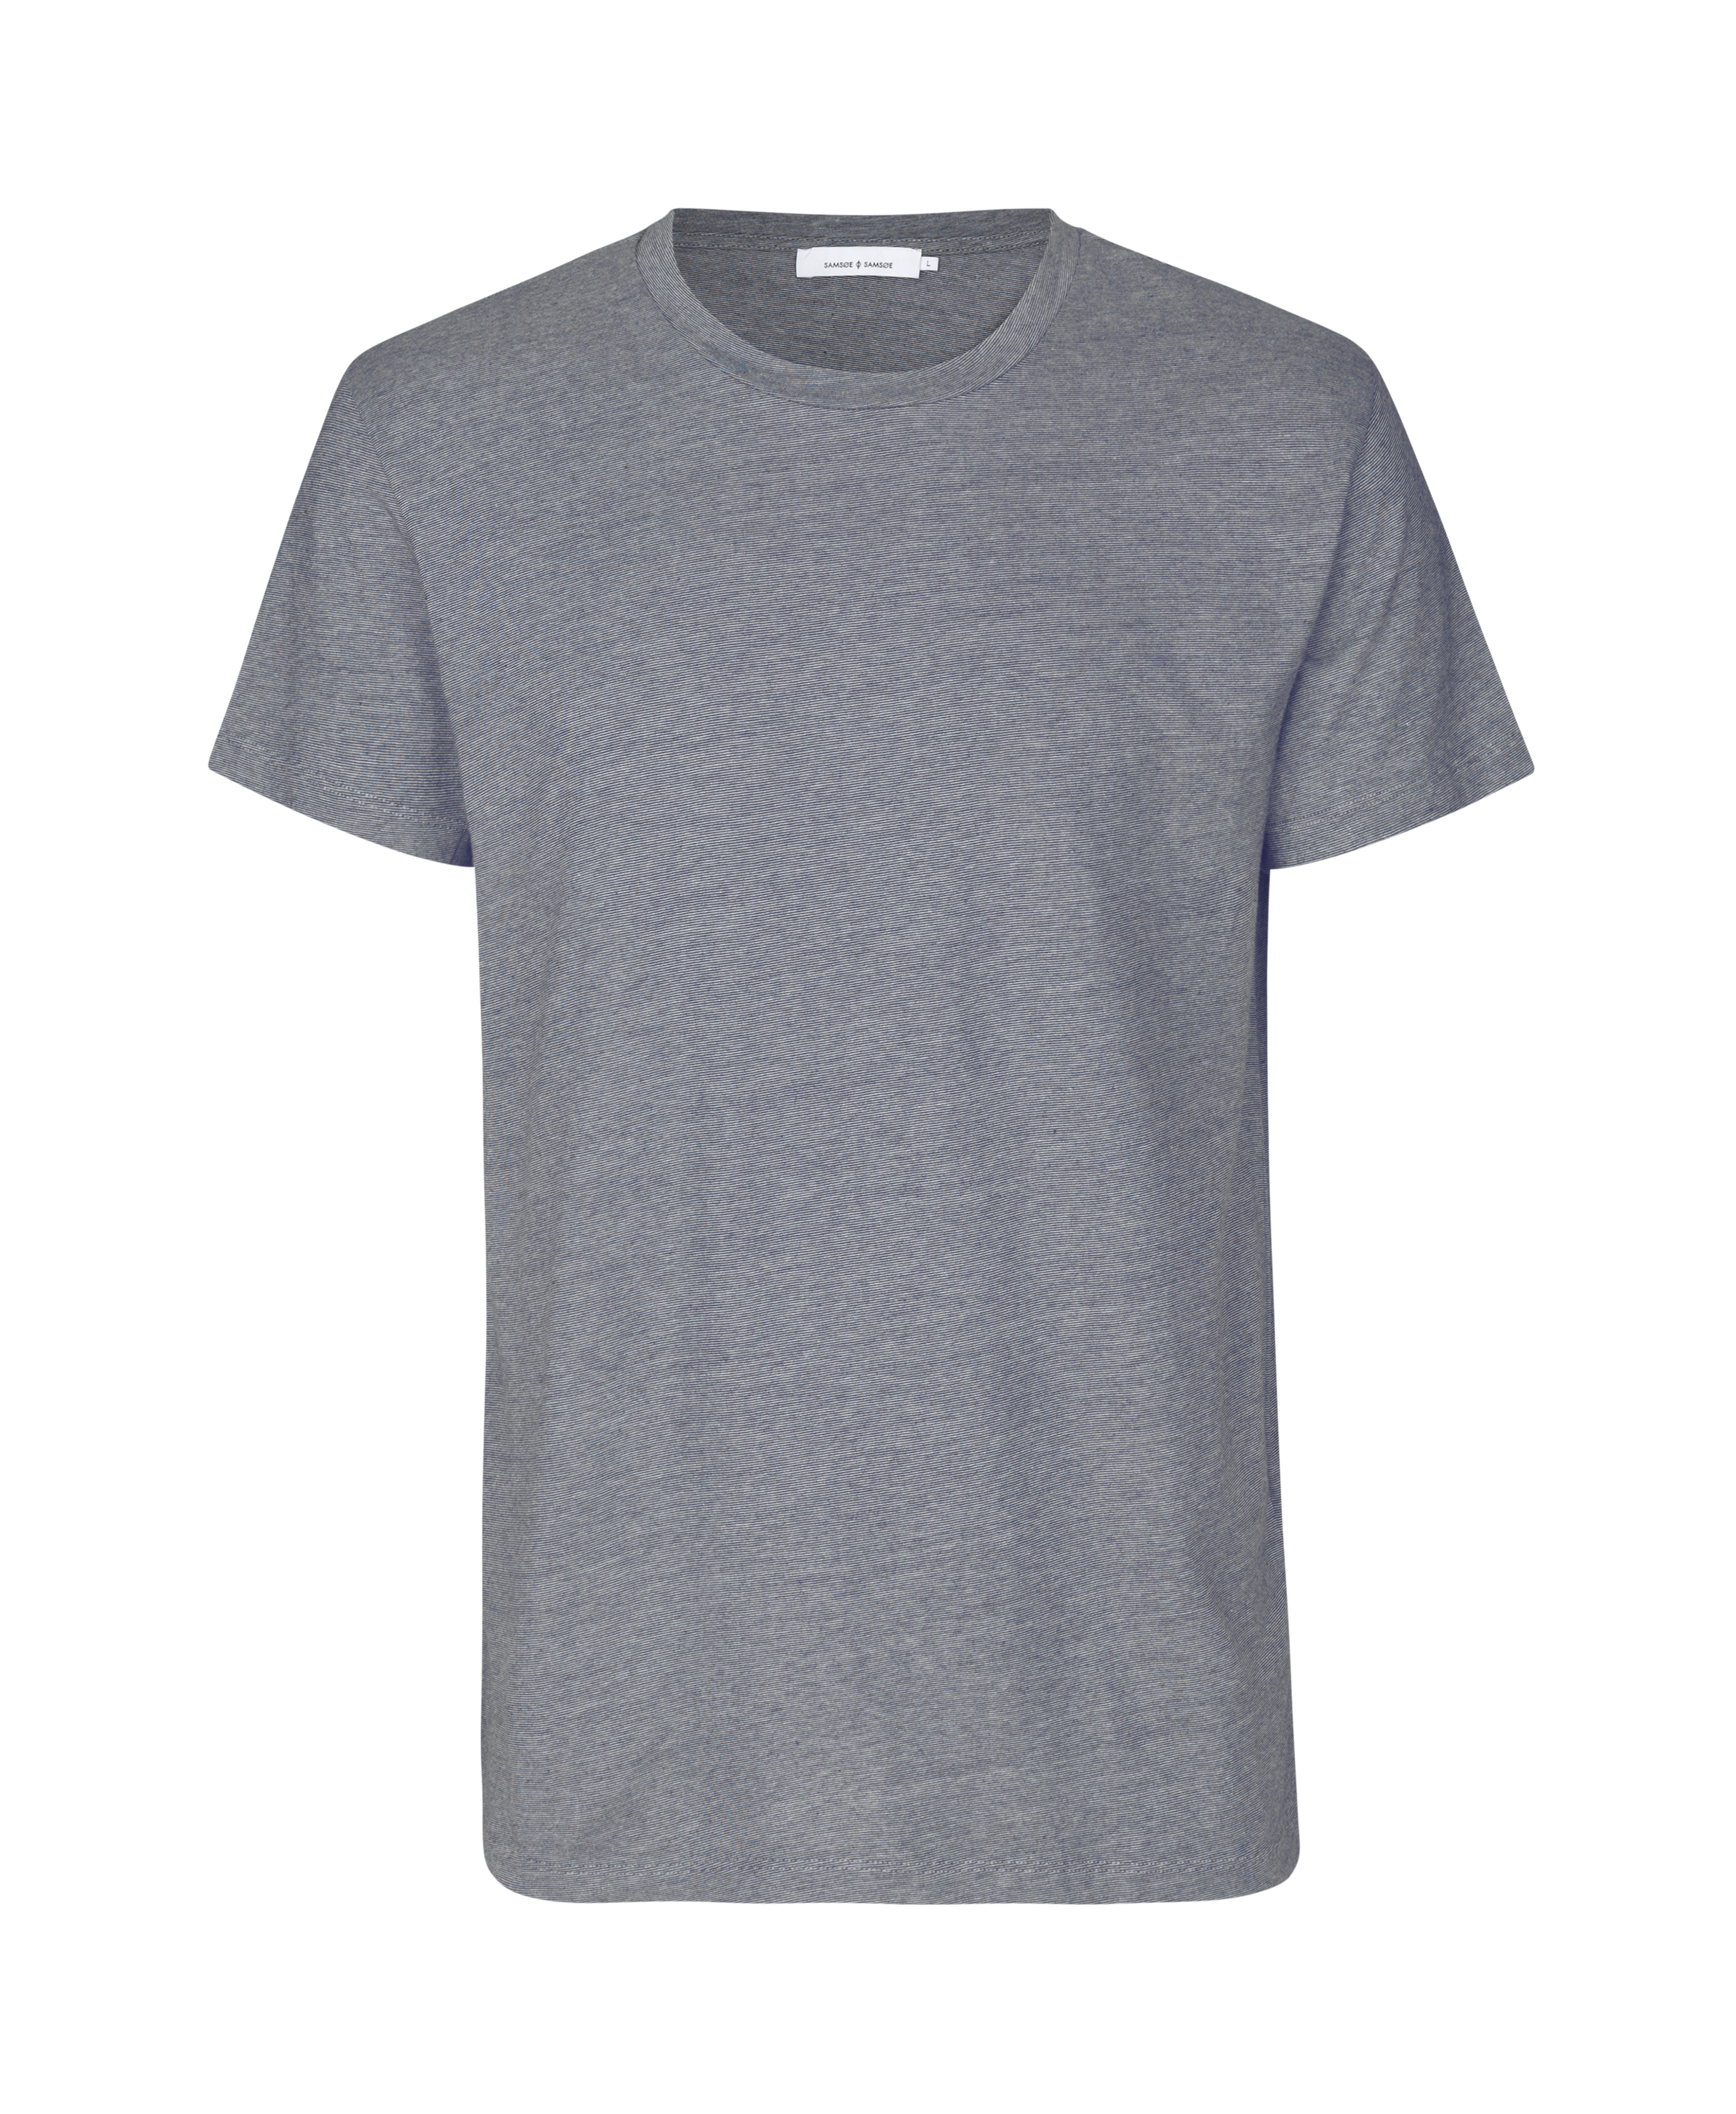 Samsøe & Samsøe Kronos O-N Stripe t-shirt